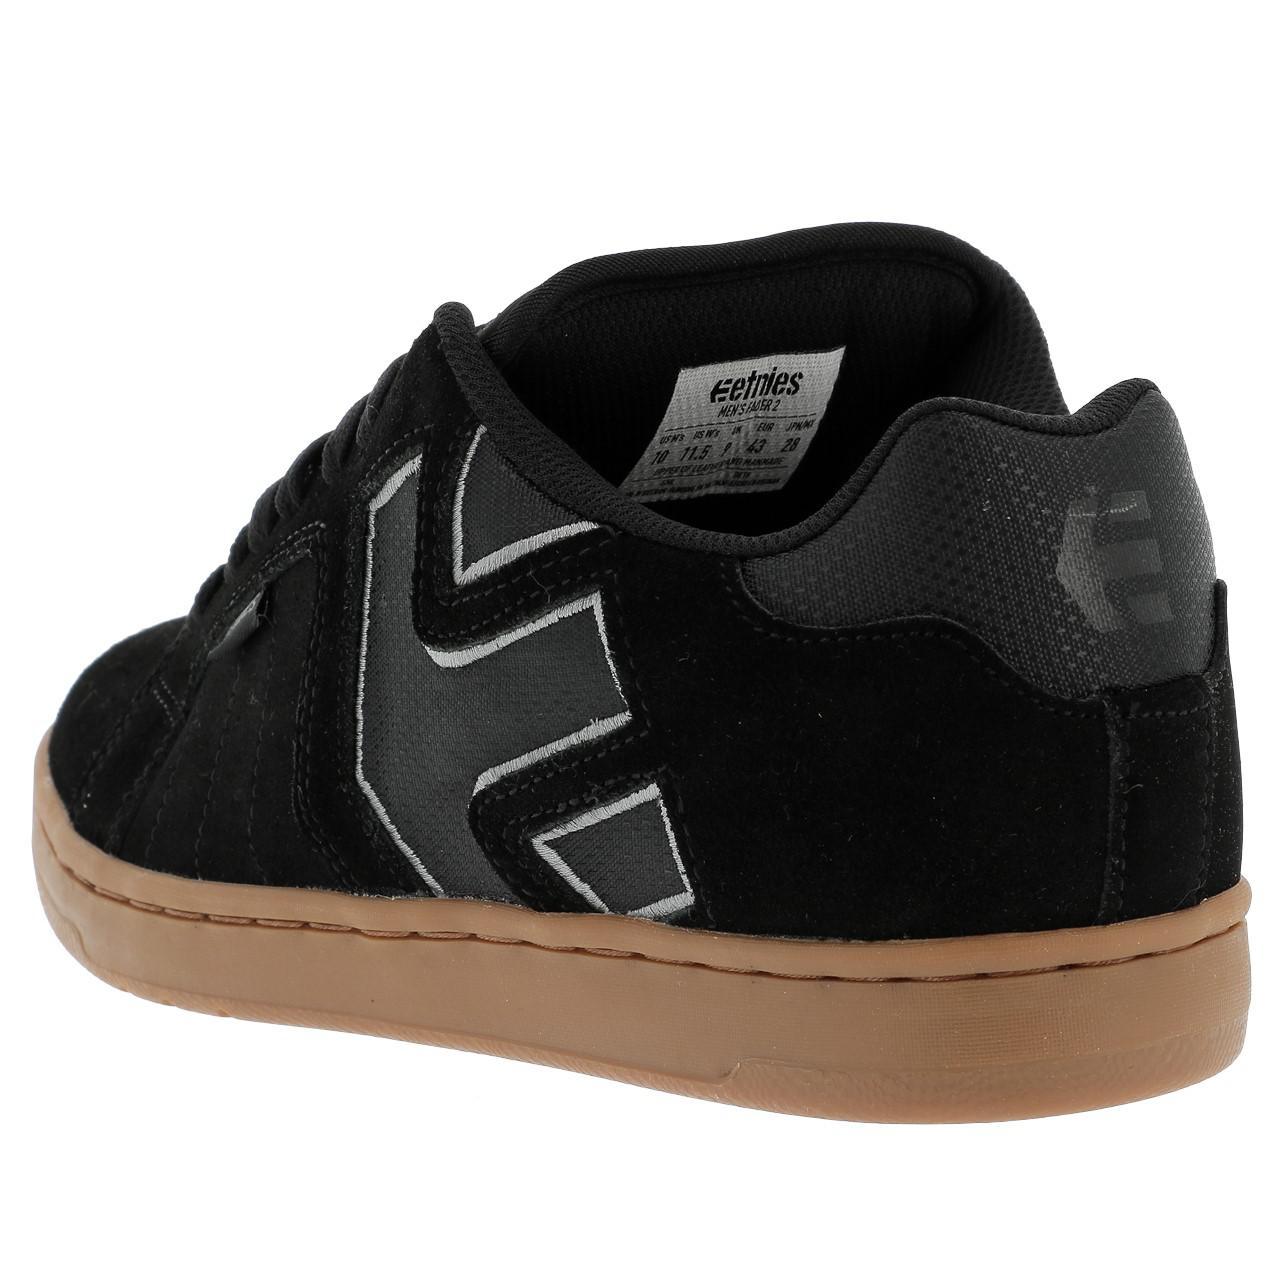 Shoes-Skateboard-Etnies-Fader-Black-Grey-Gum-Black-39127-New thumbnail 3